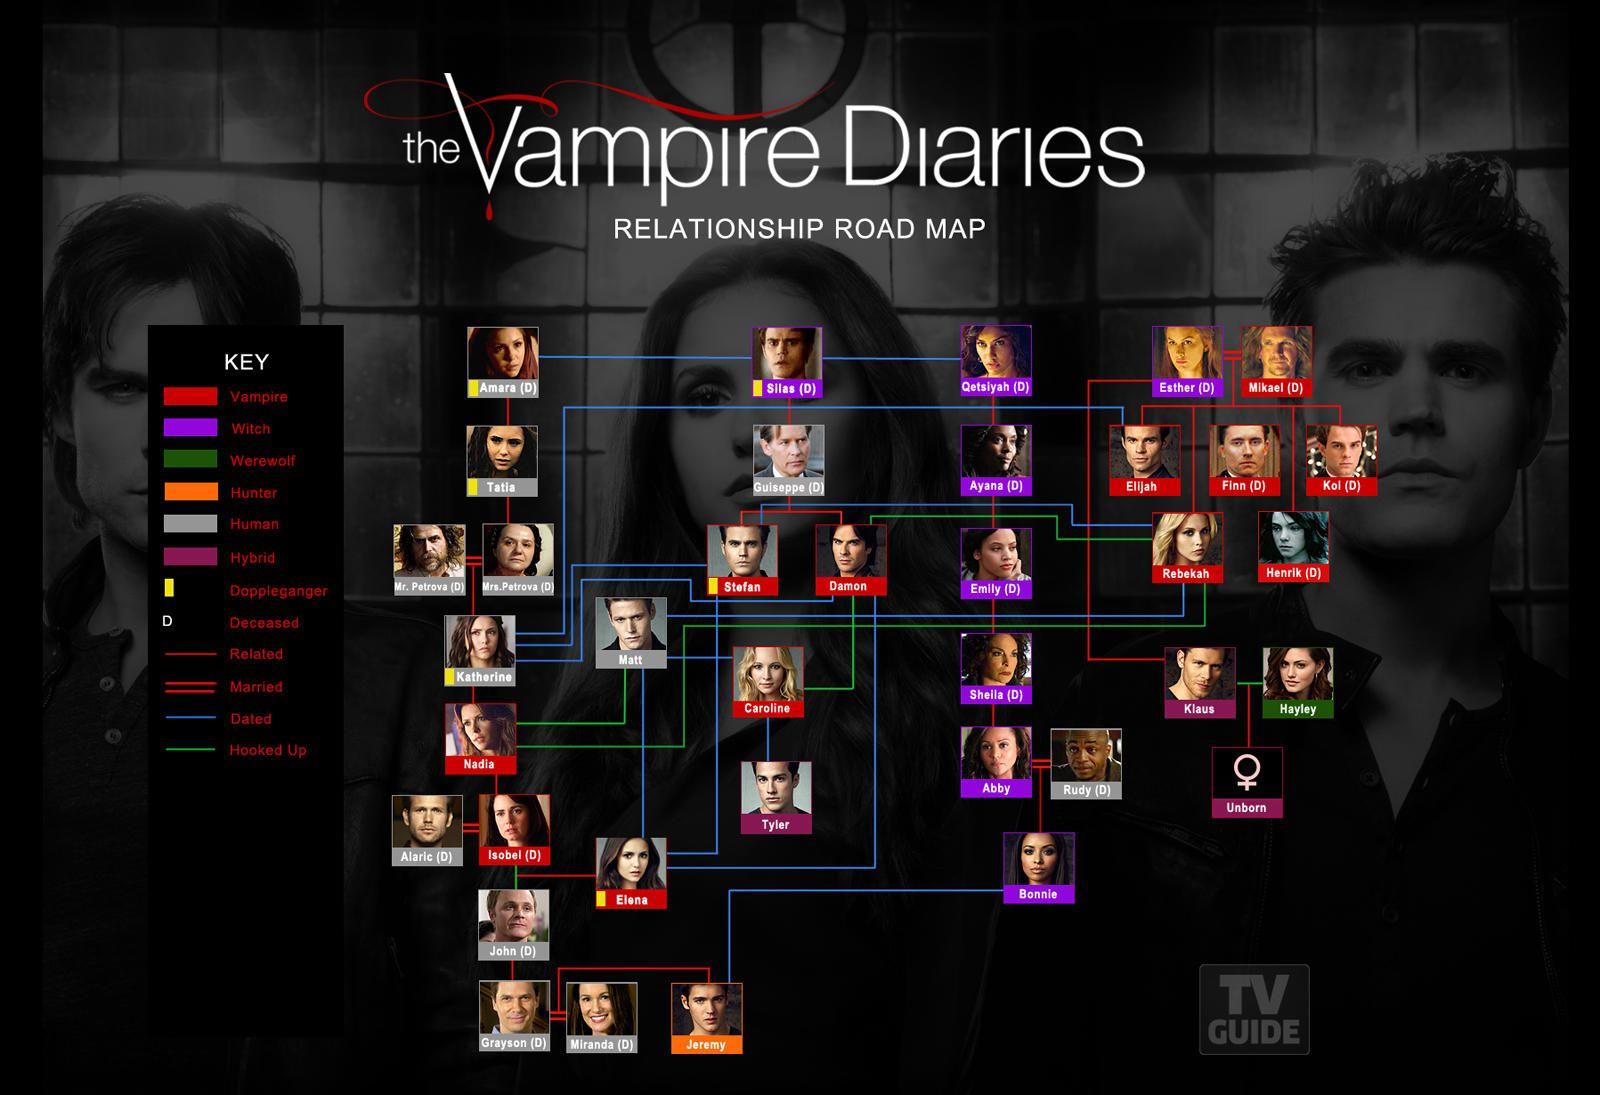 Mystic Falls Wallpaper The Vampire Diaries Relationship Road Map Tvguide Com